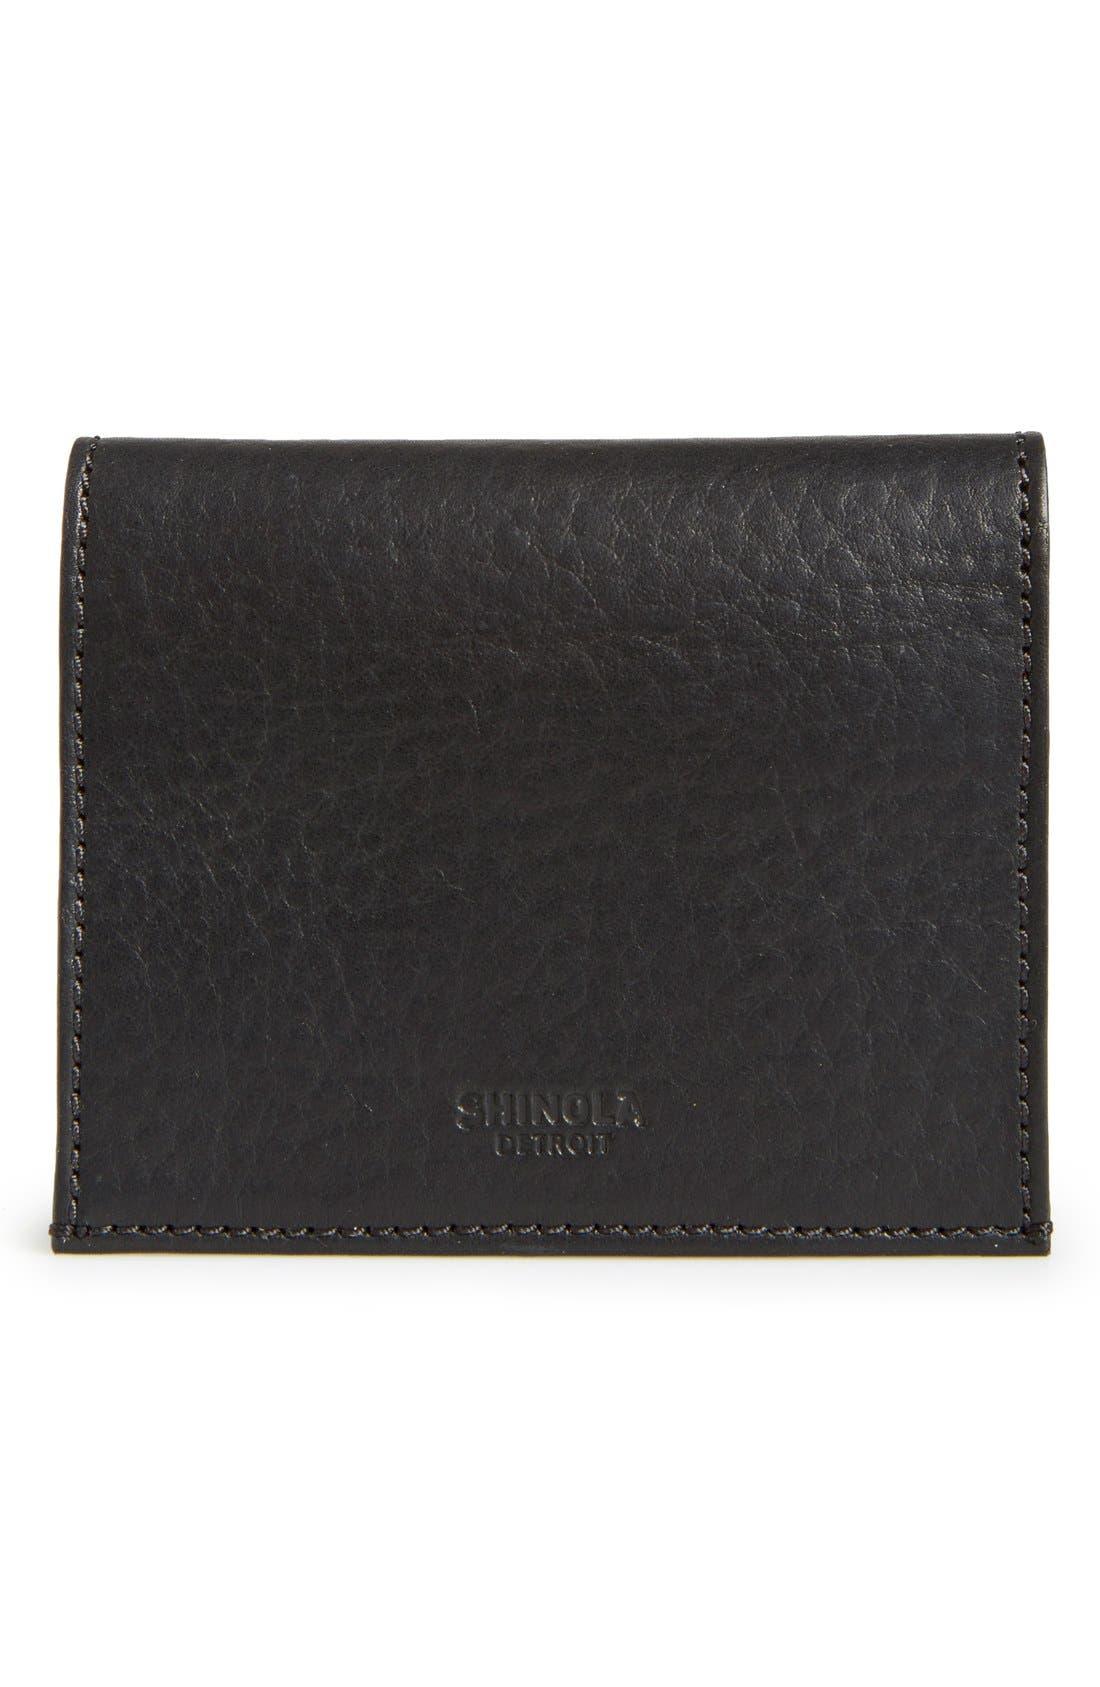 Alternate Image 1 Selected - Shinola Gusset Leather Card Case